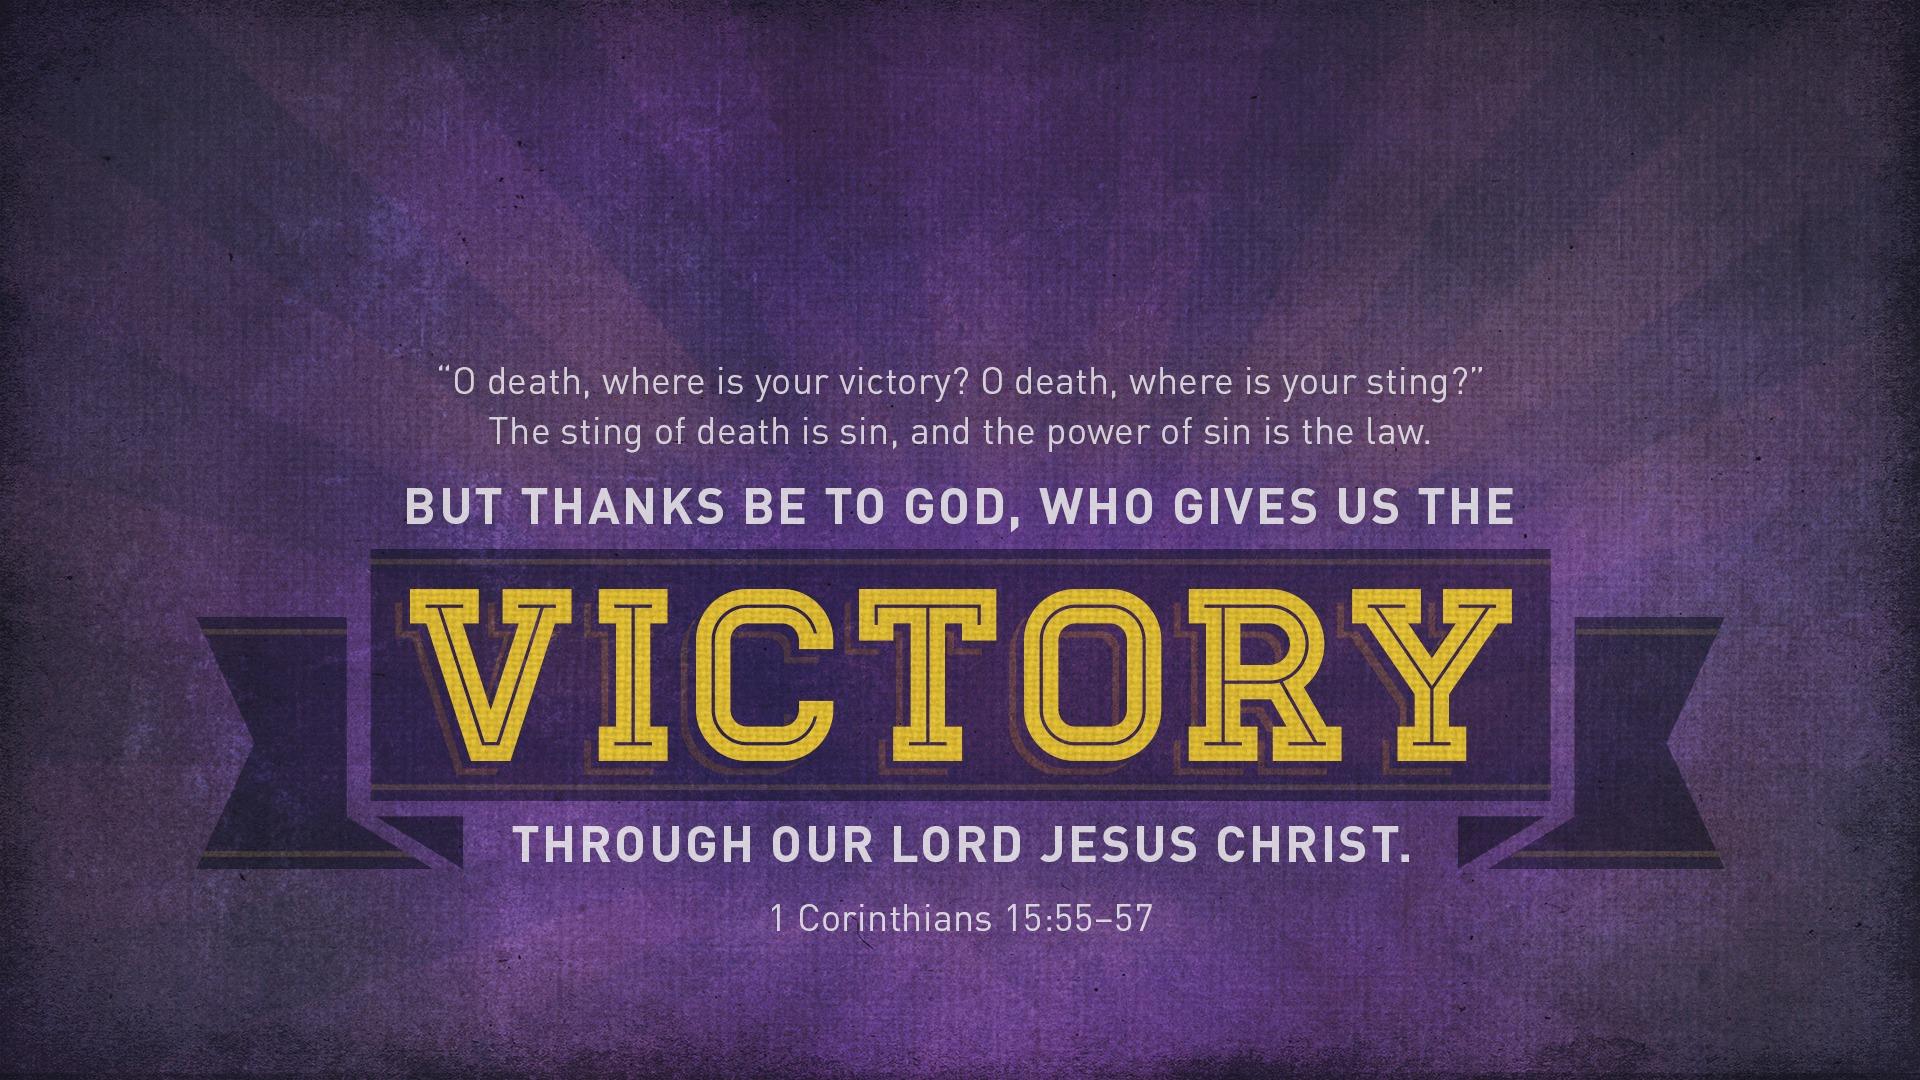 1 Corinthians 155758 NIV  But thanks be to God! He